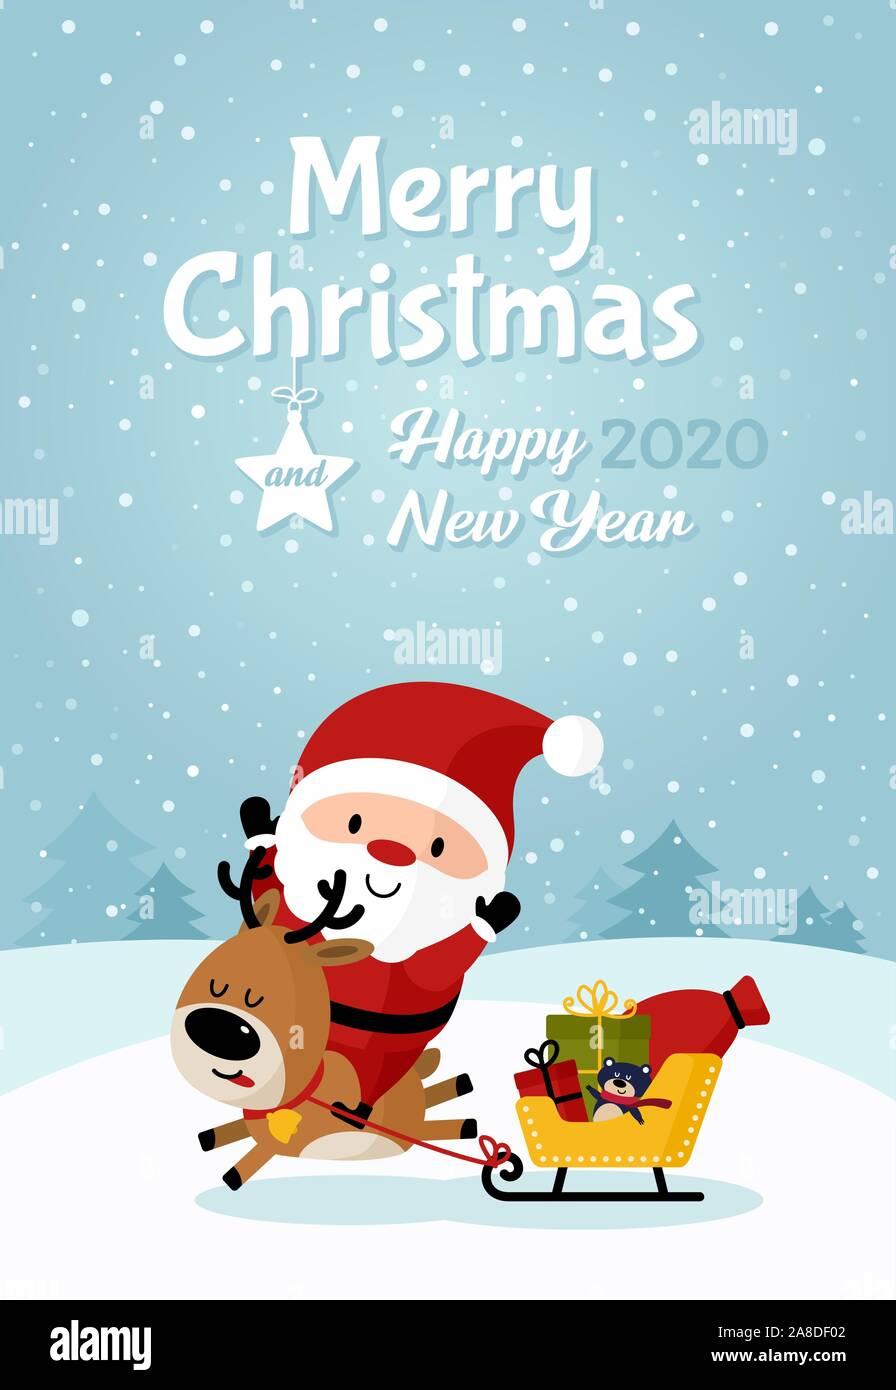 Резултат со слика за PHOTOS OF NEW YEAR CARDS  SANTA CLAUSE 2020